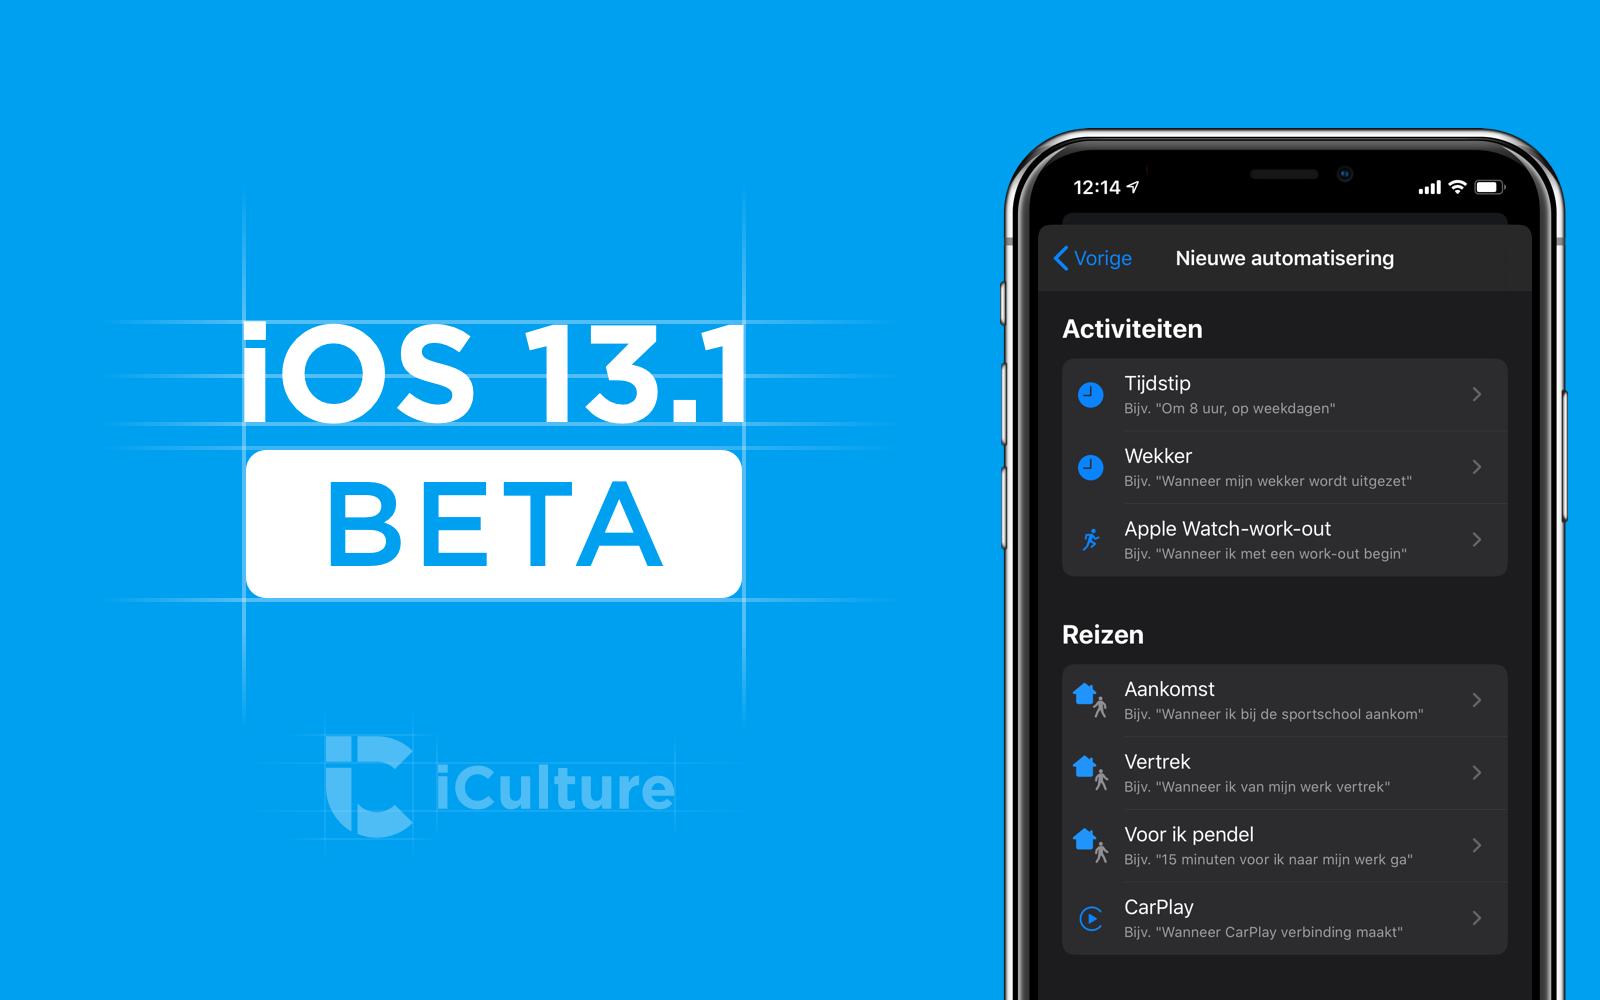 iOS 13.1 beta.